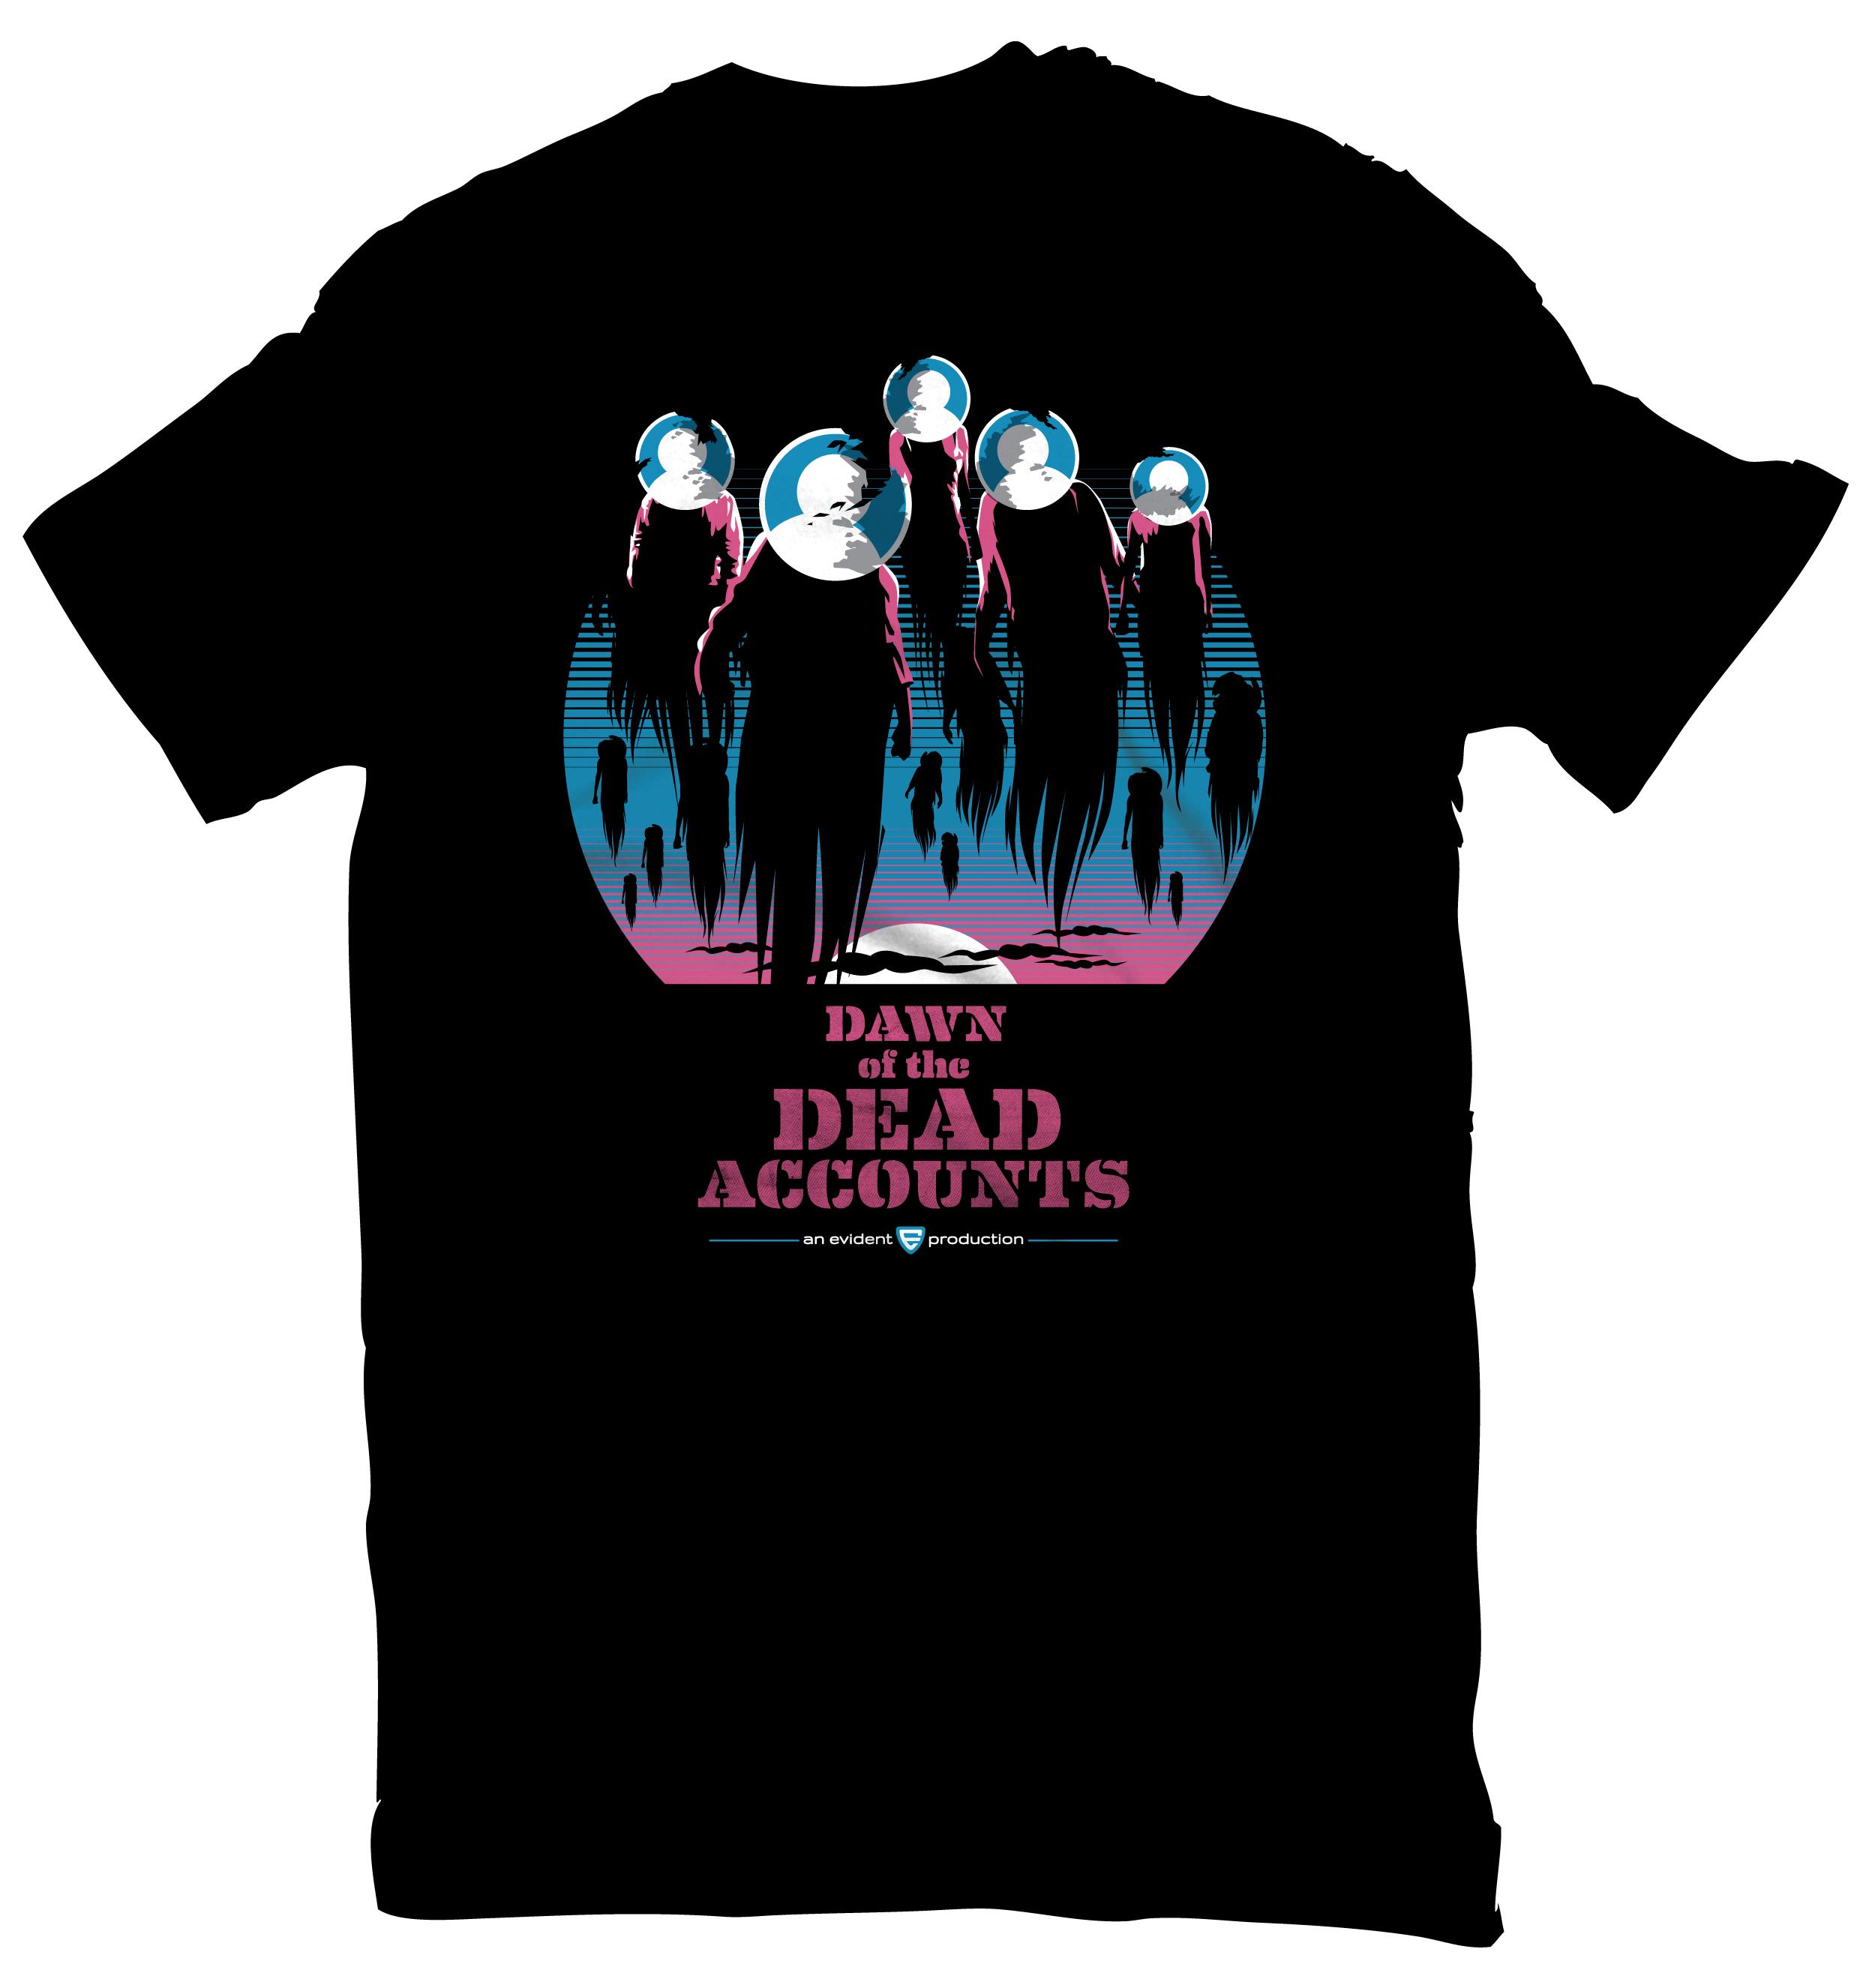 monster-movies-evident_dead-accounts-shirt.jpg